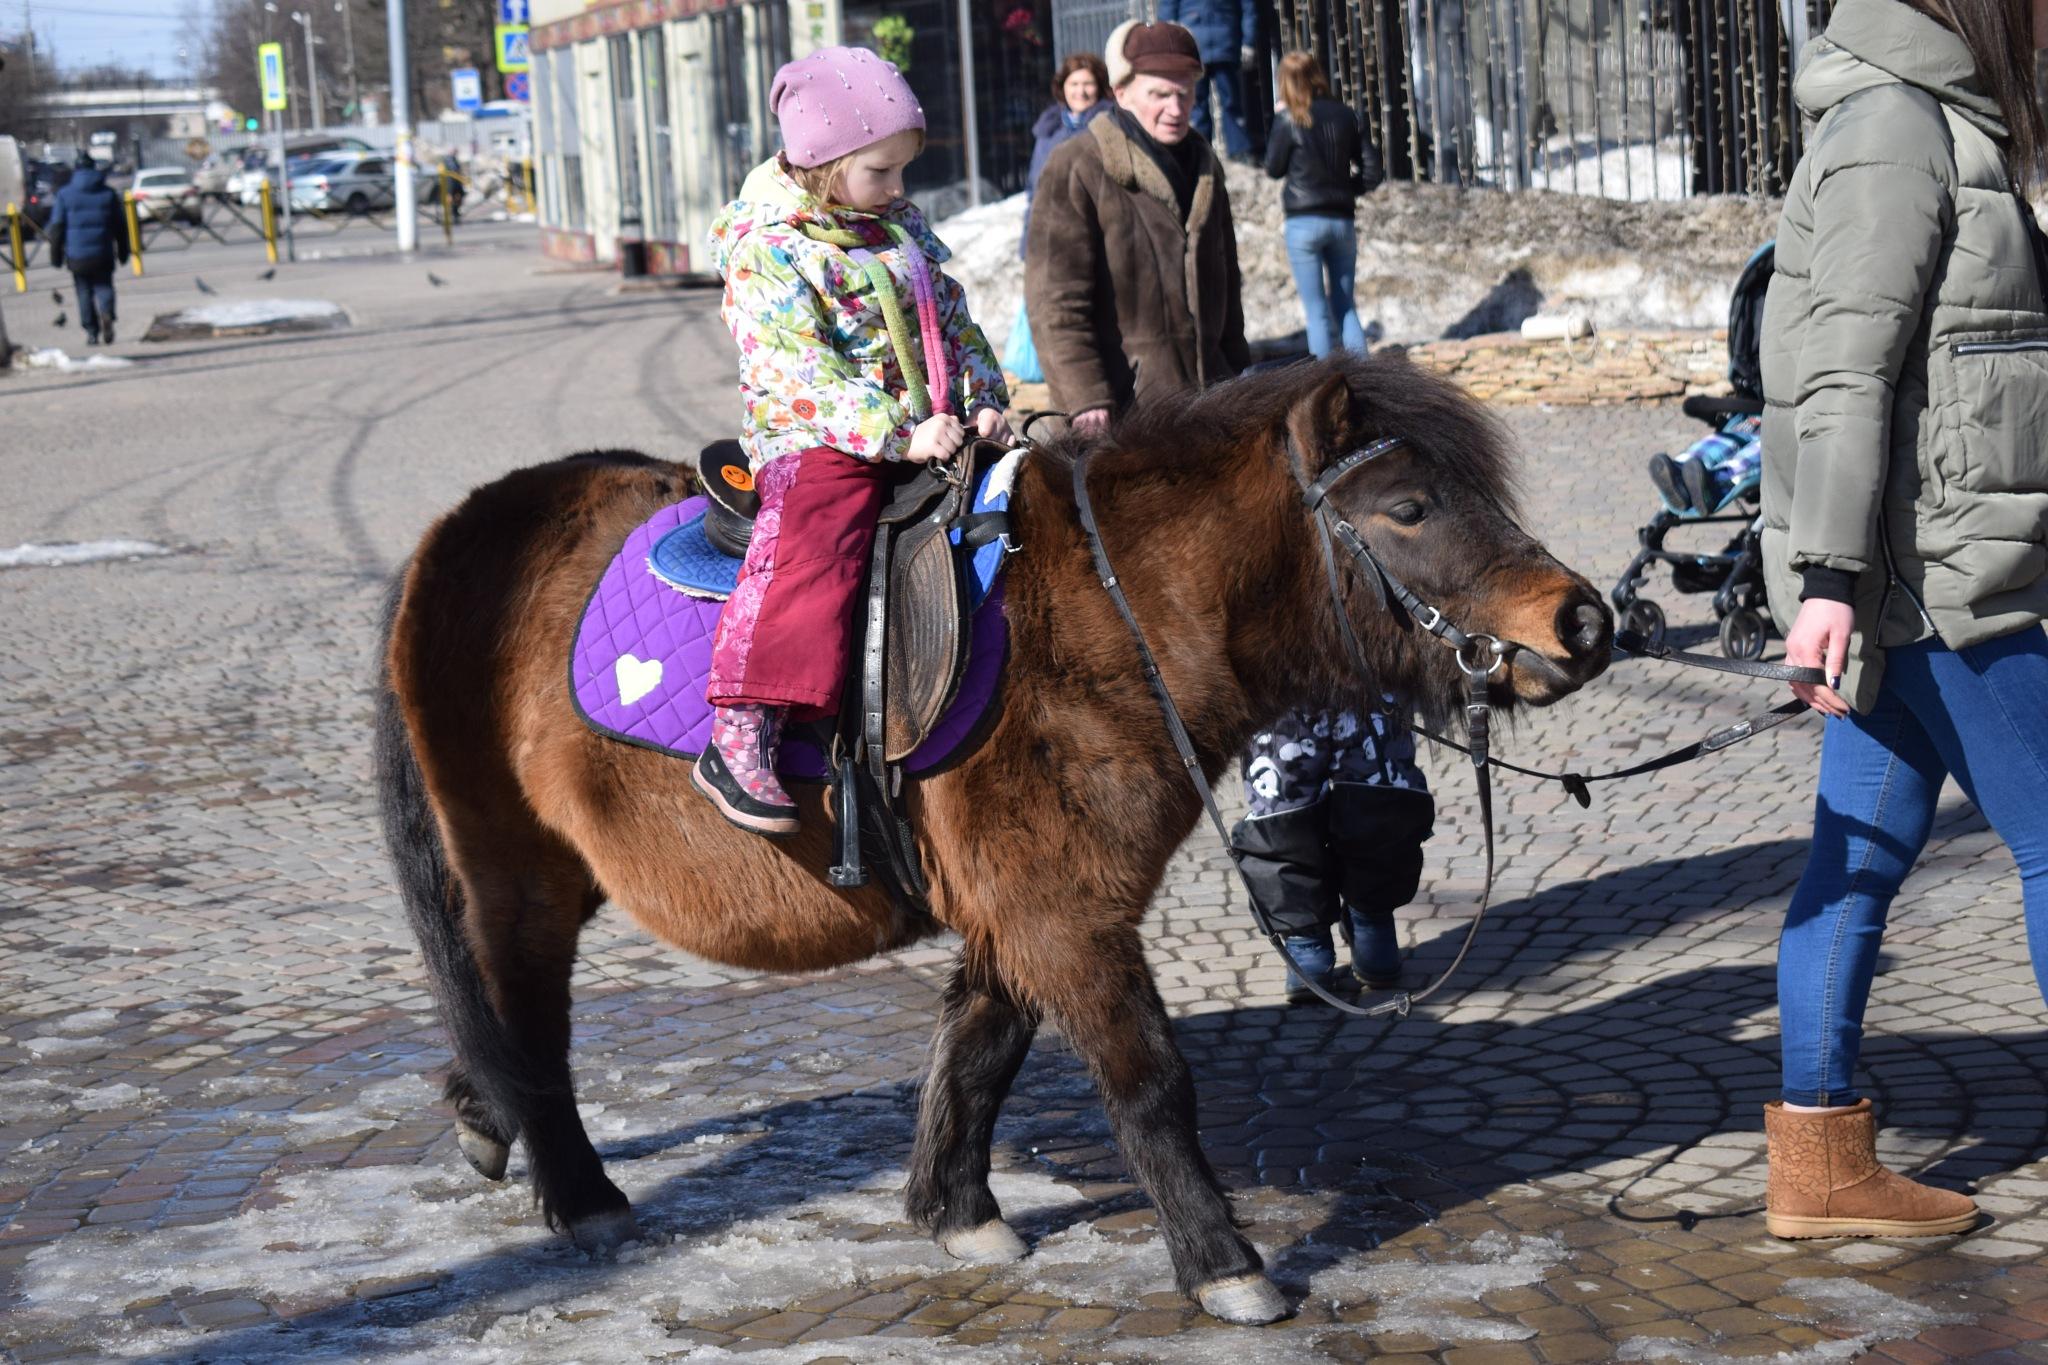 horse riding by Vadim Alibalaev